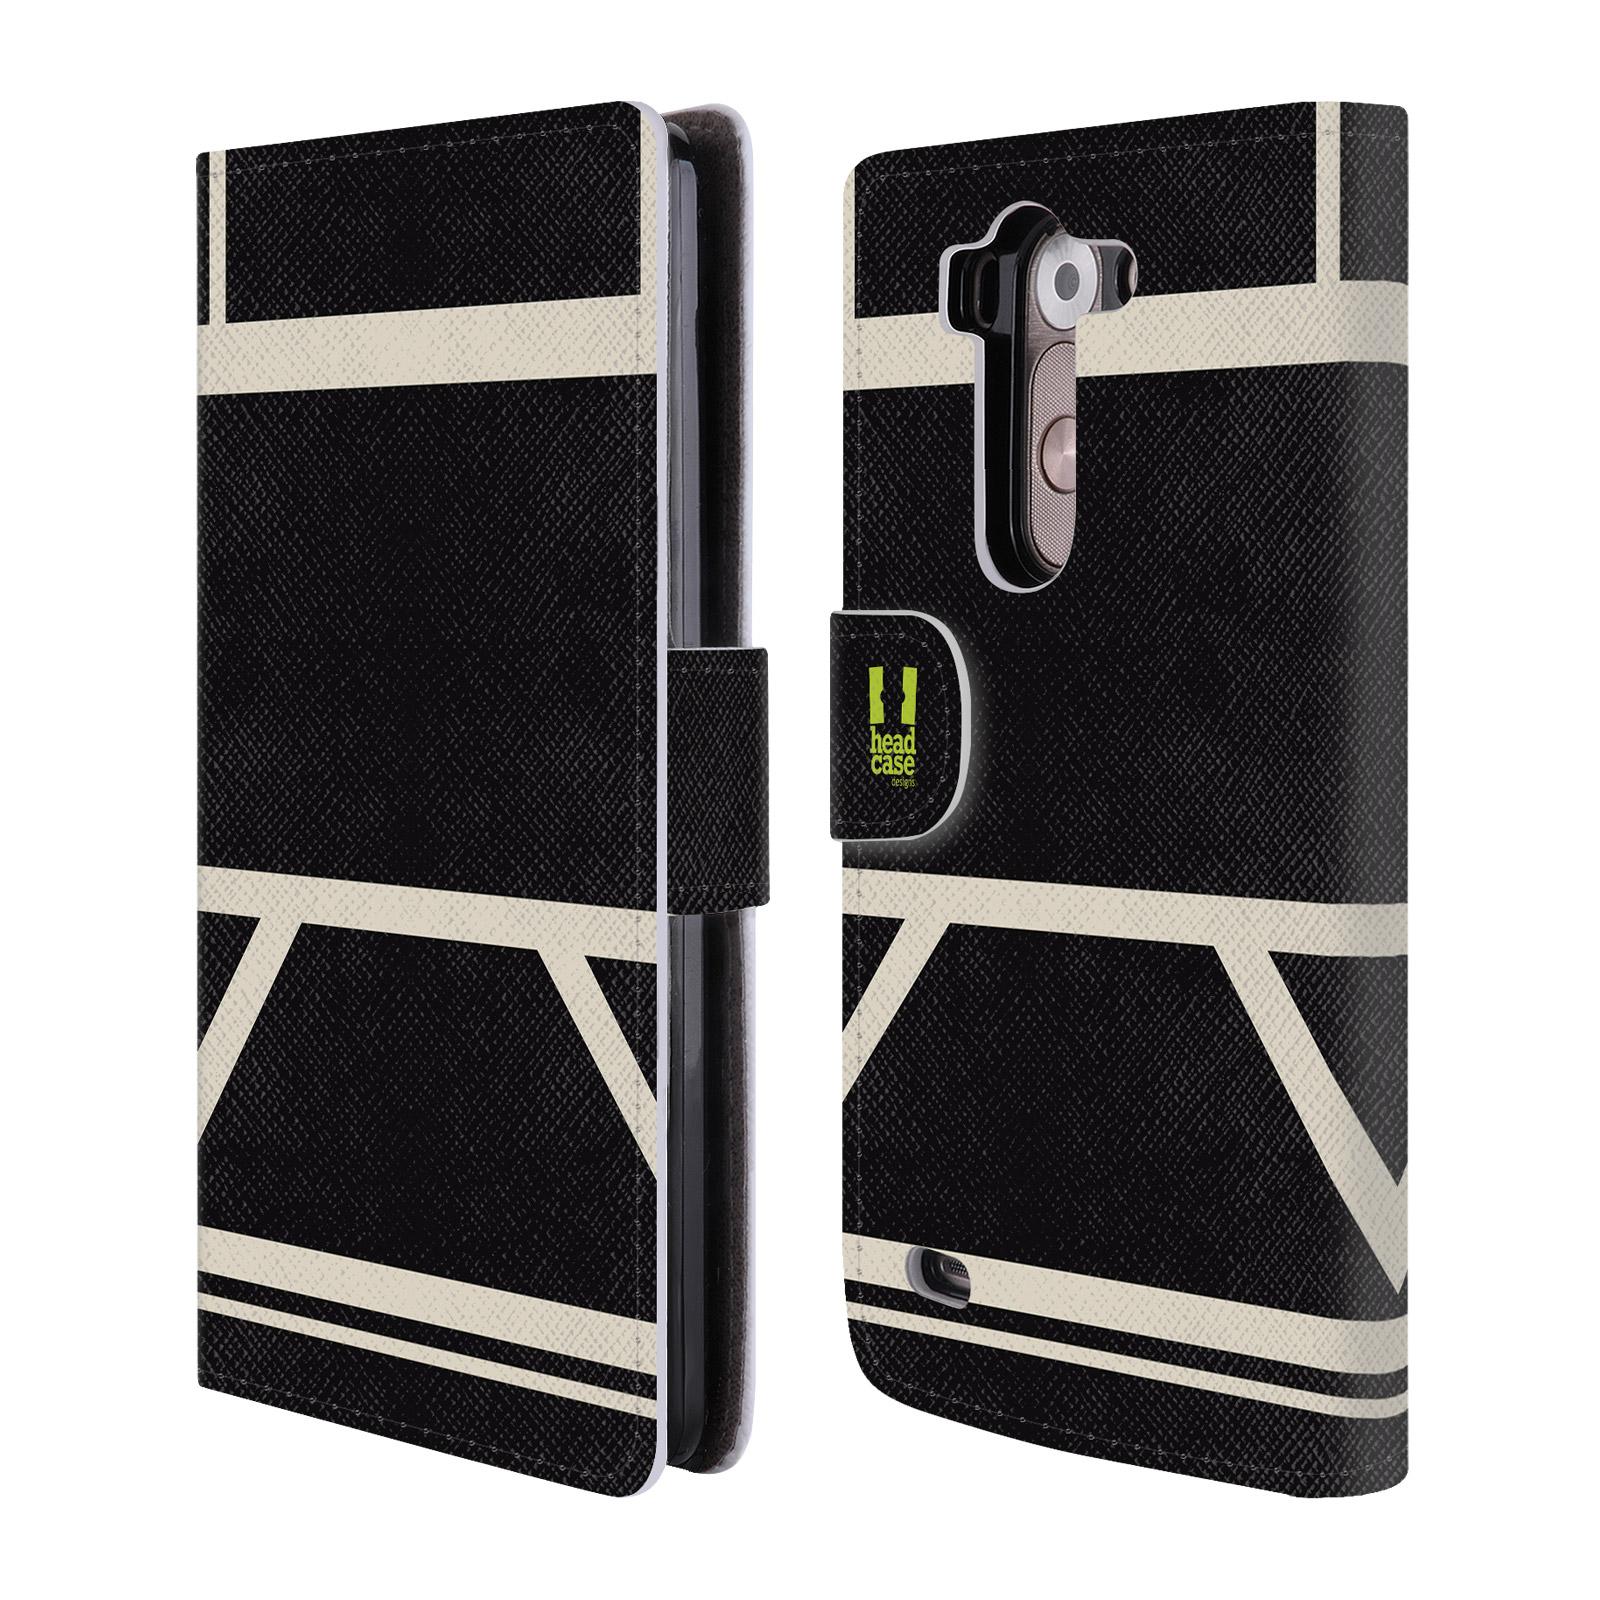 HEAD CASE Flipové pouzdro pro mobil LG G3s barevné tvary černá a bílá proužek